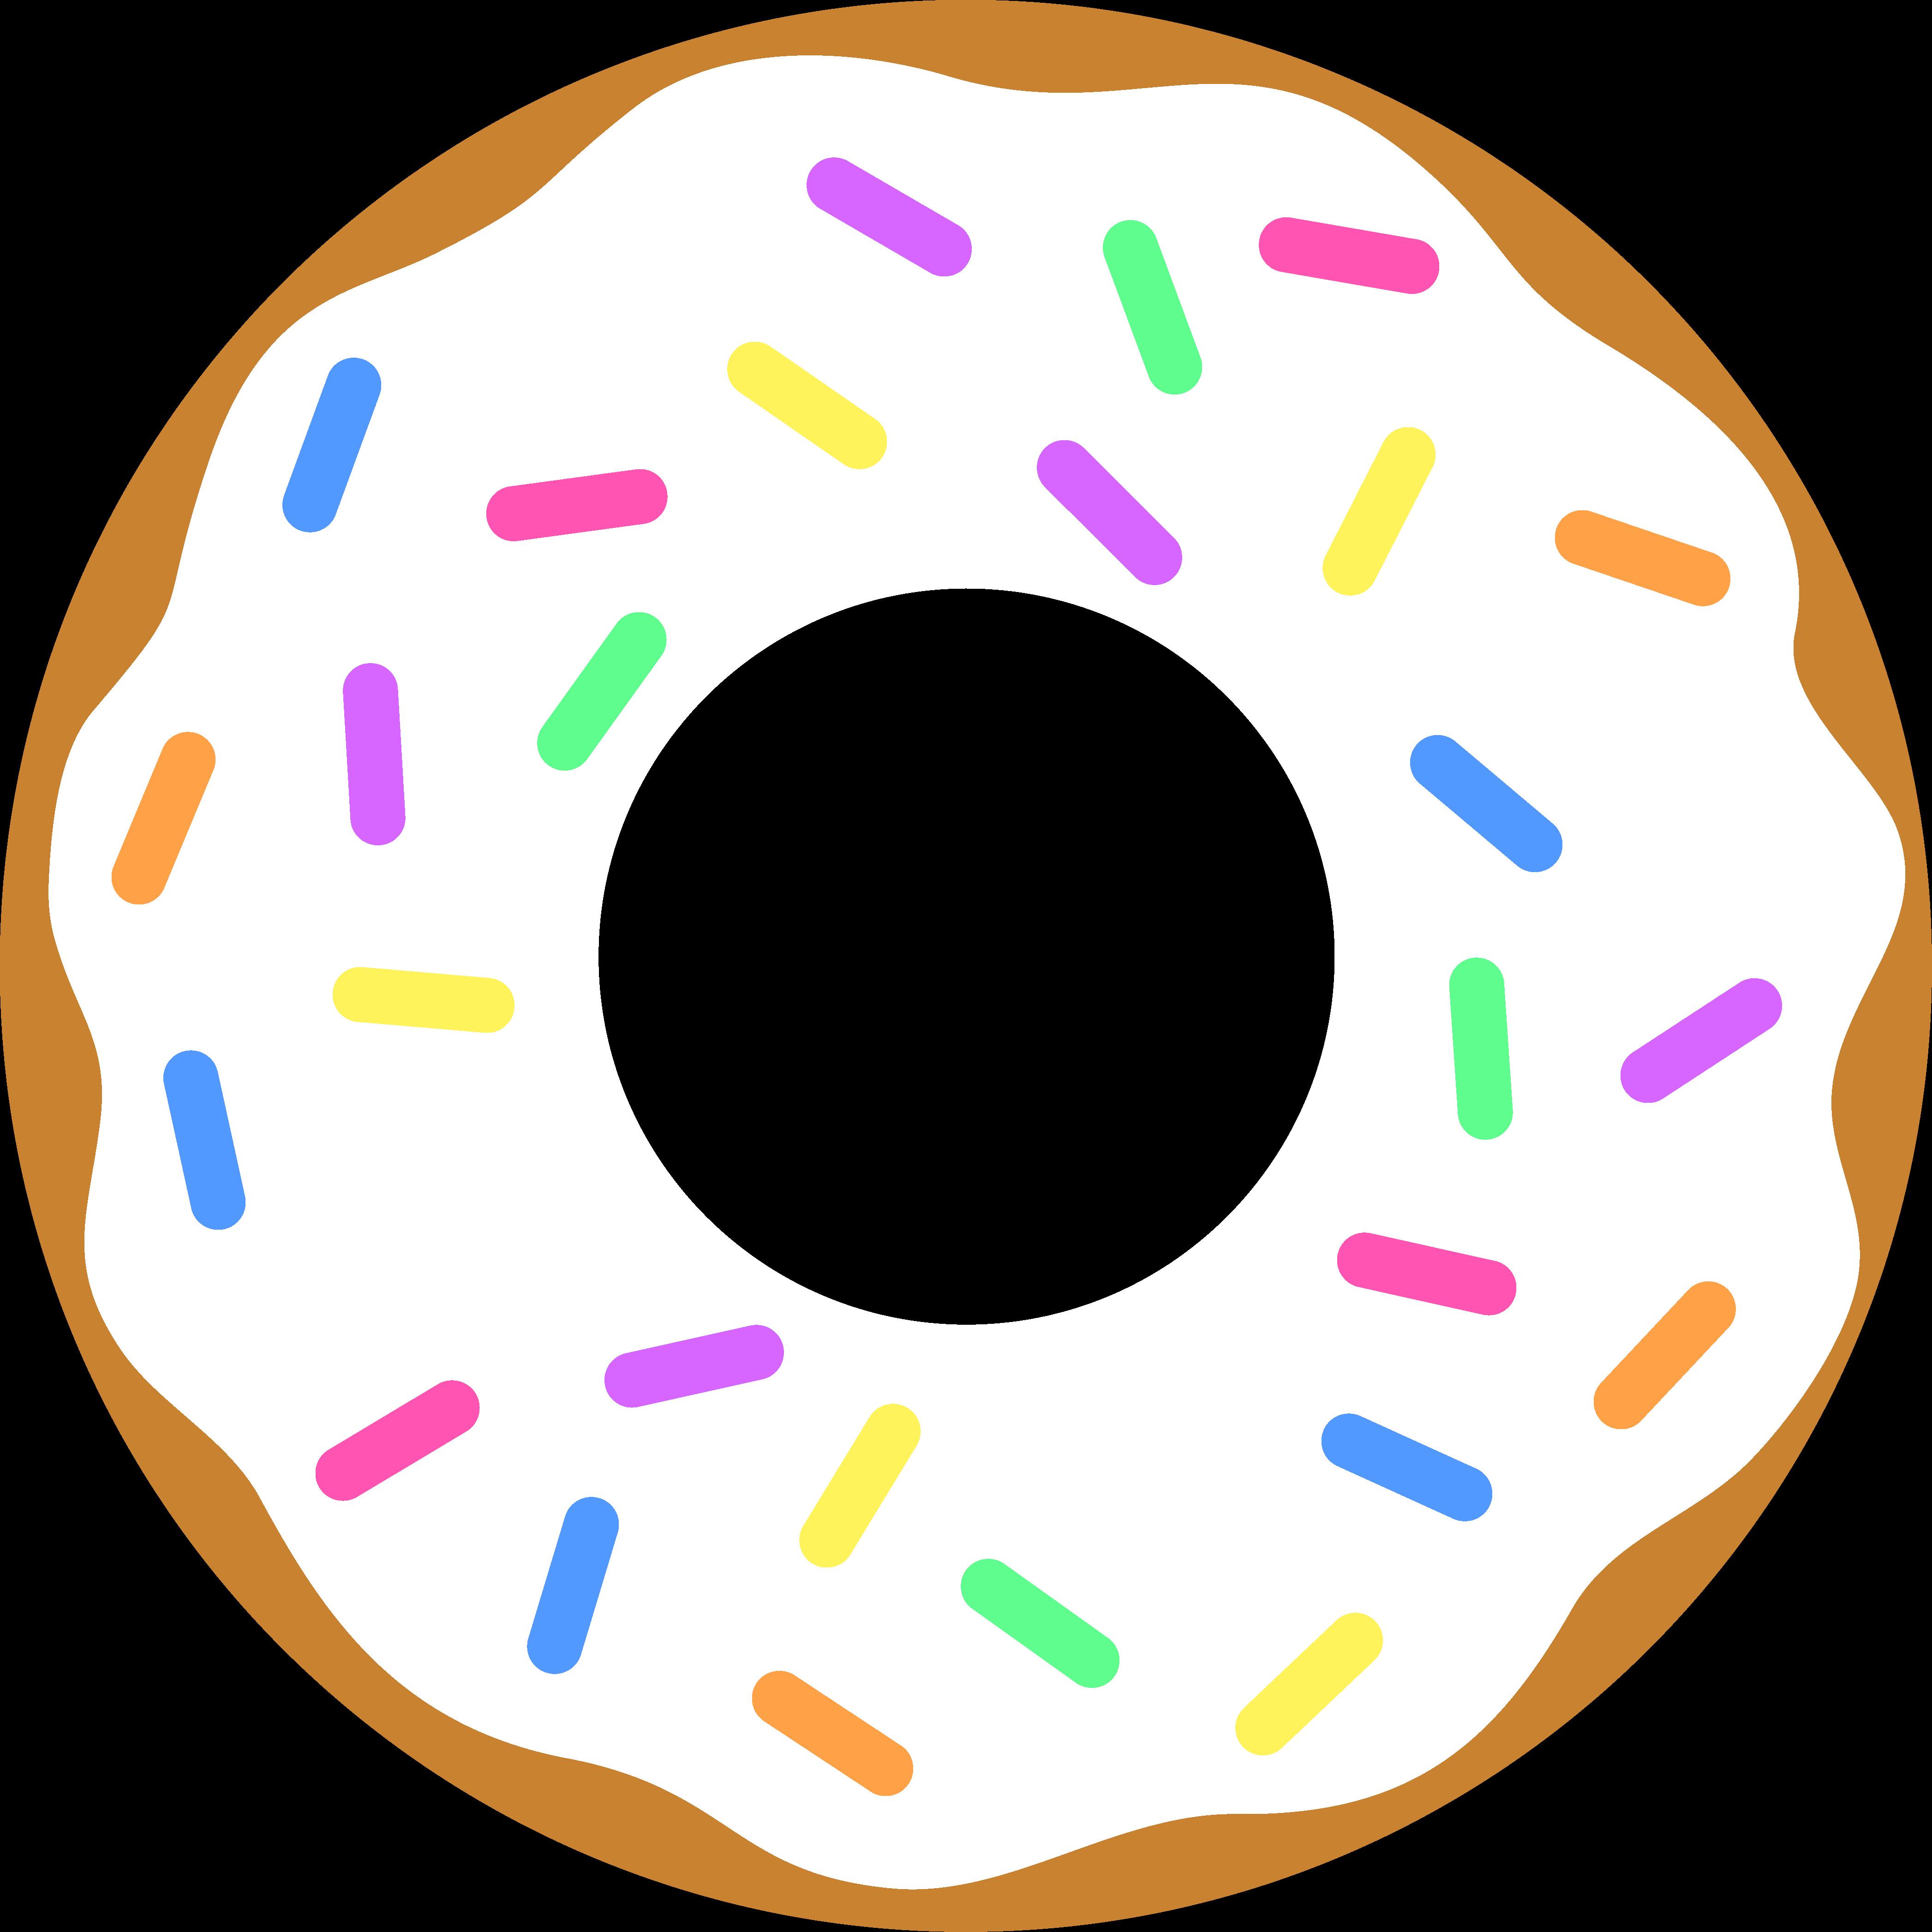 Clip art frames illustrations. Donuts clipart beignet